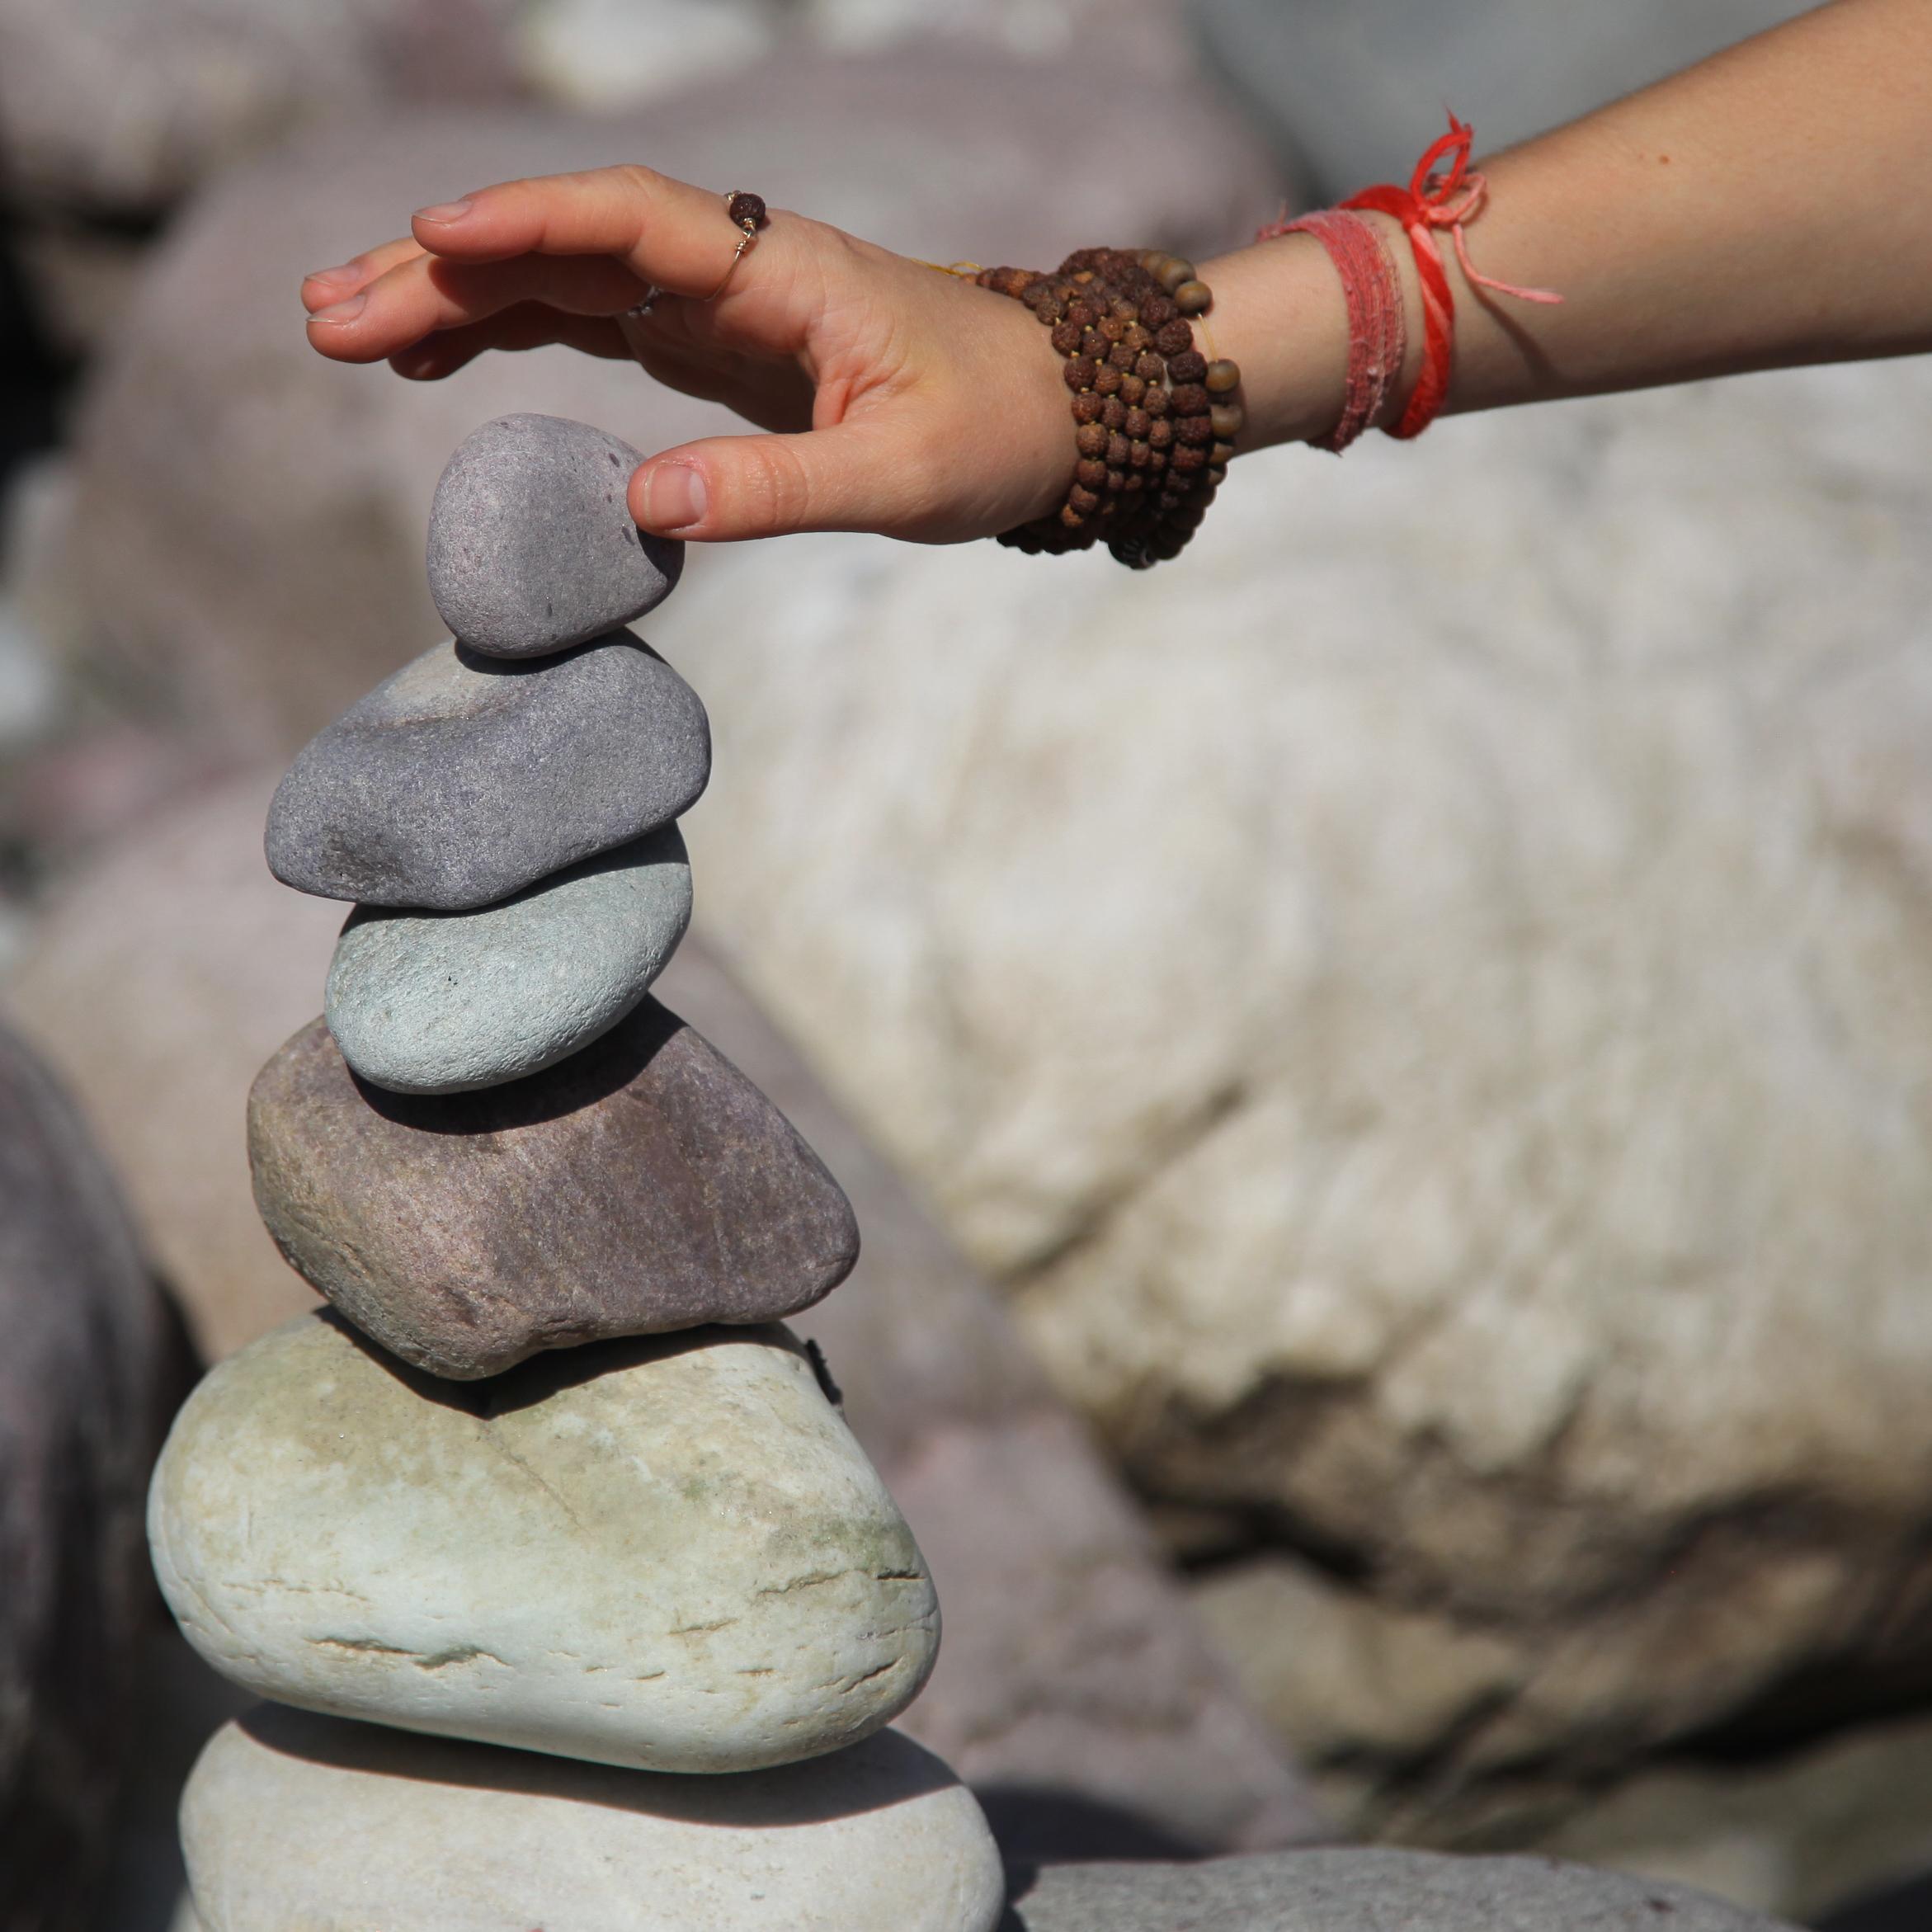 Chakravidya : 7 périodes de la vie humaine Chakravidya-couverture